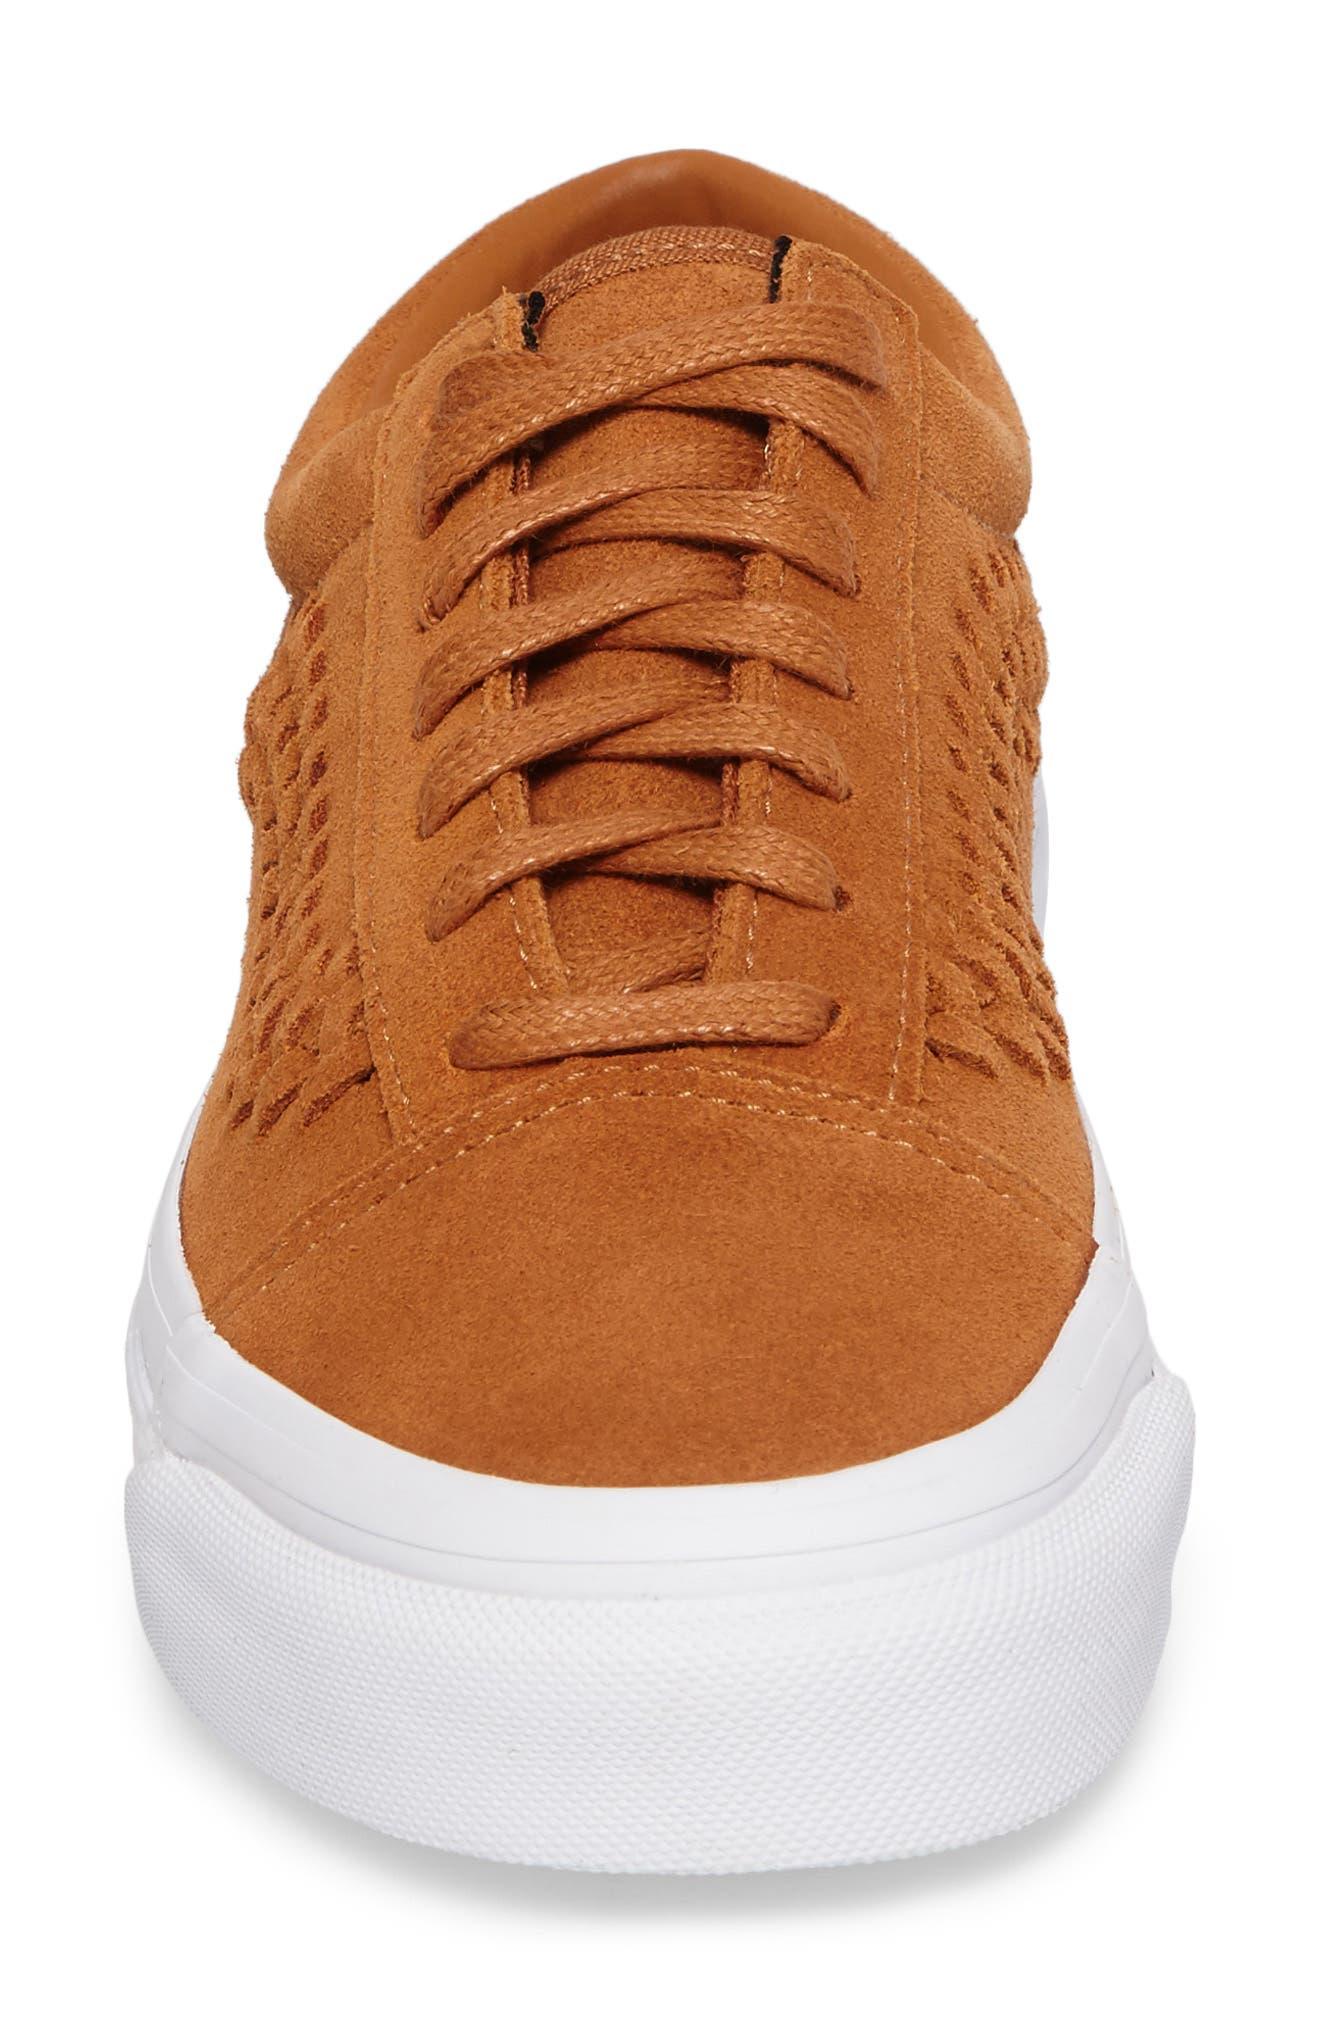 Old Skool Weave DX Sneaker,                             Alternate thumbnail 4, color,                             200